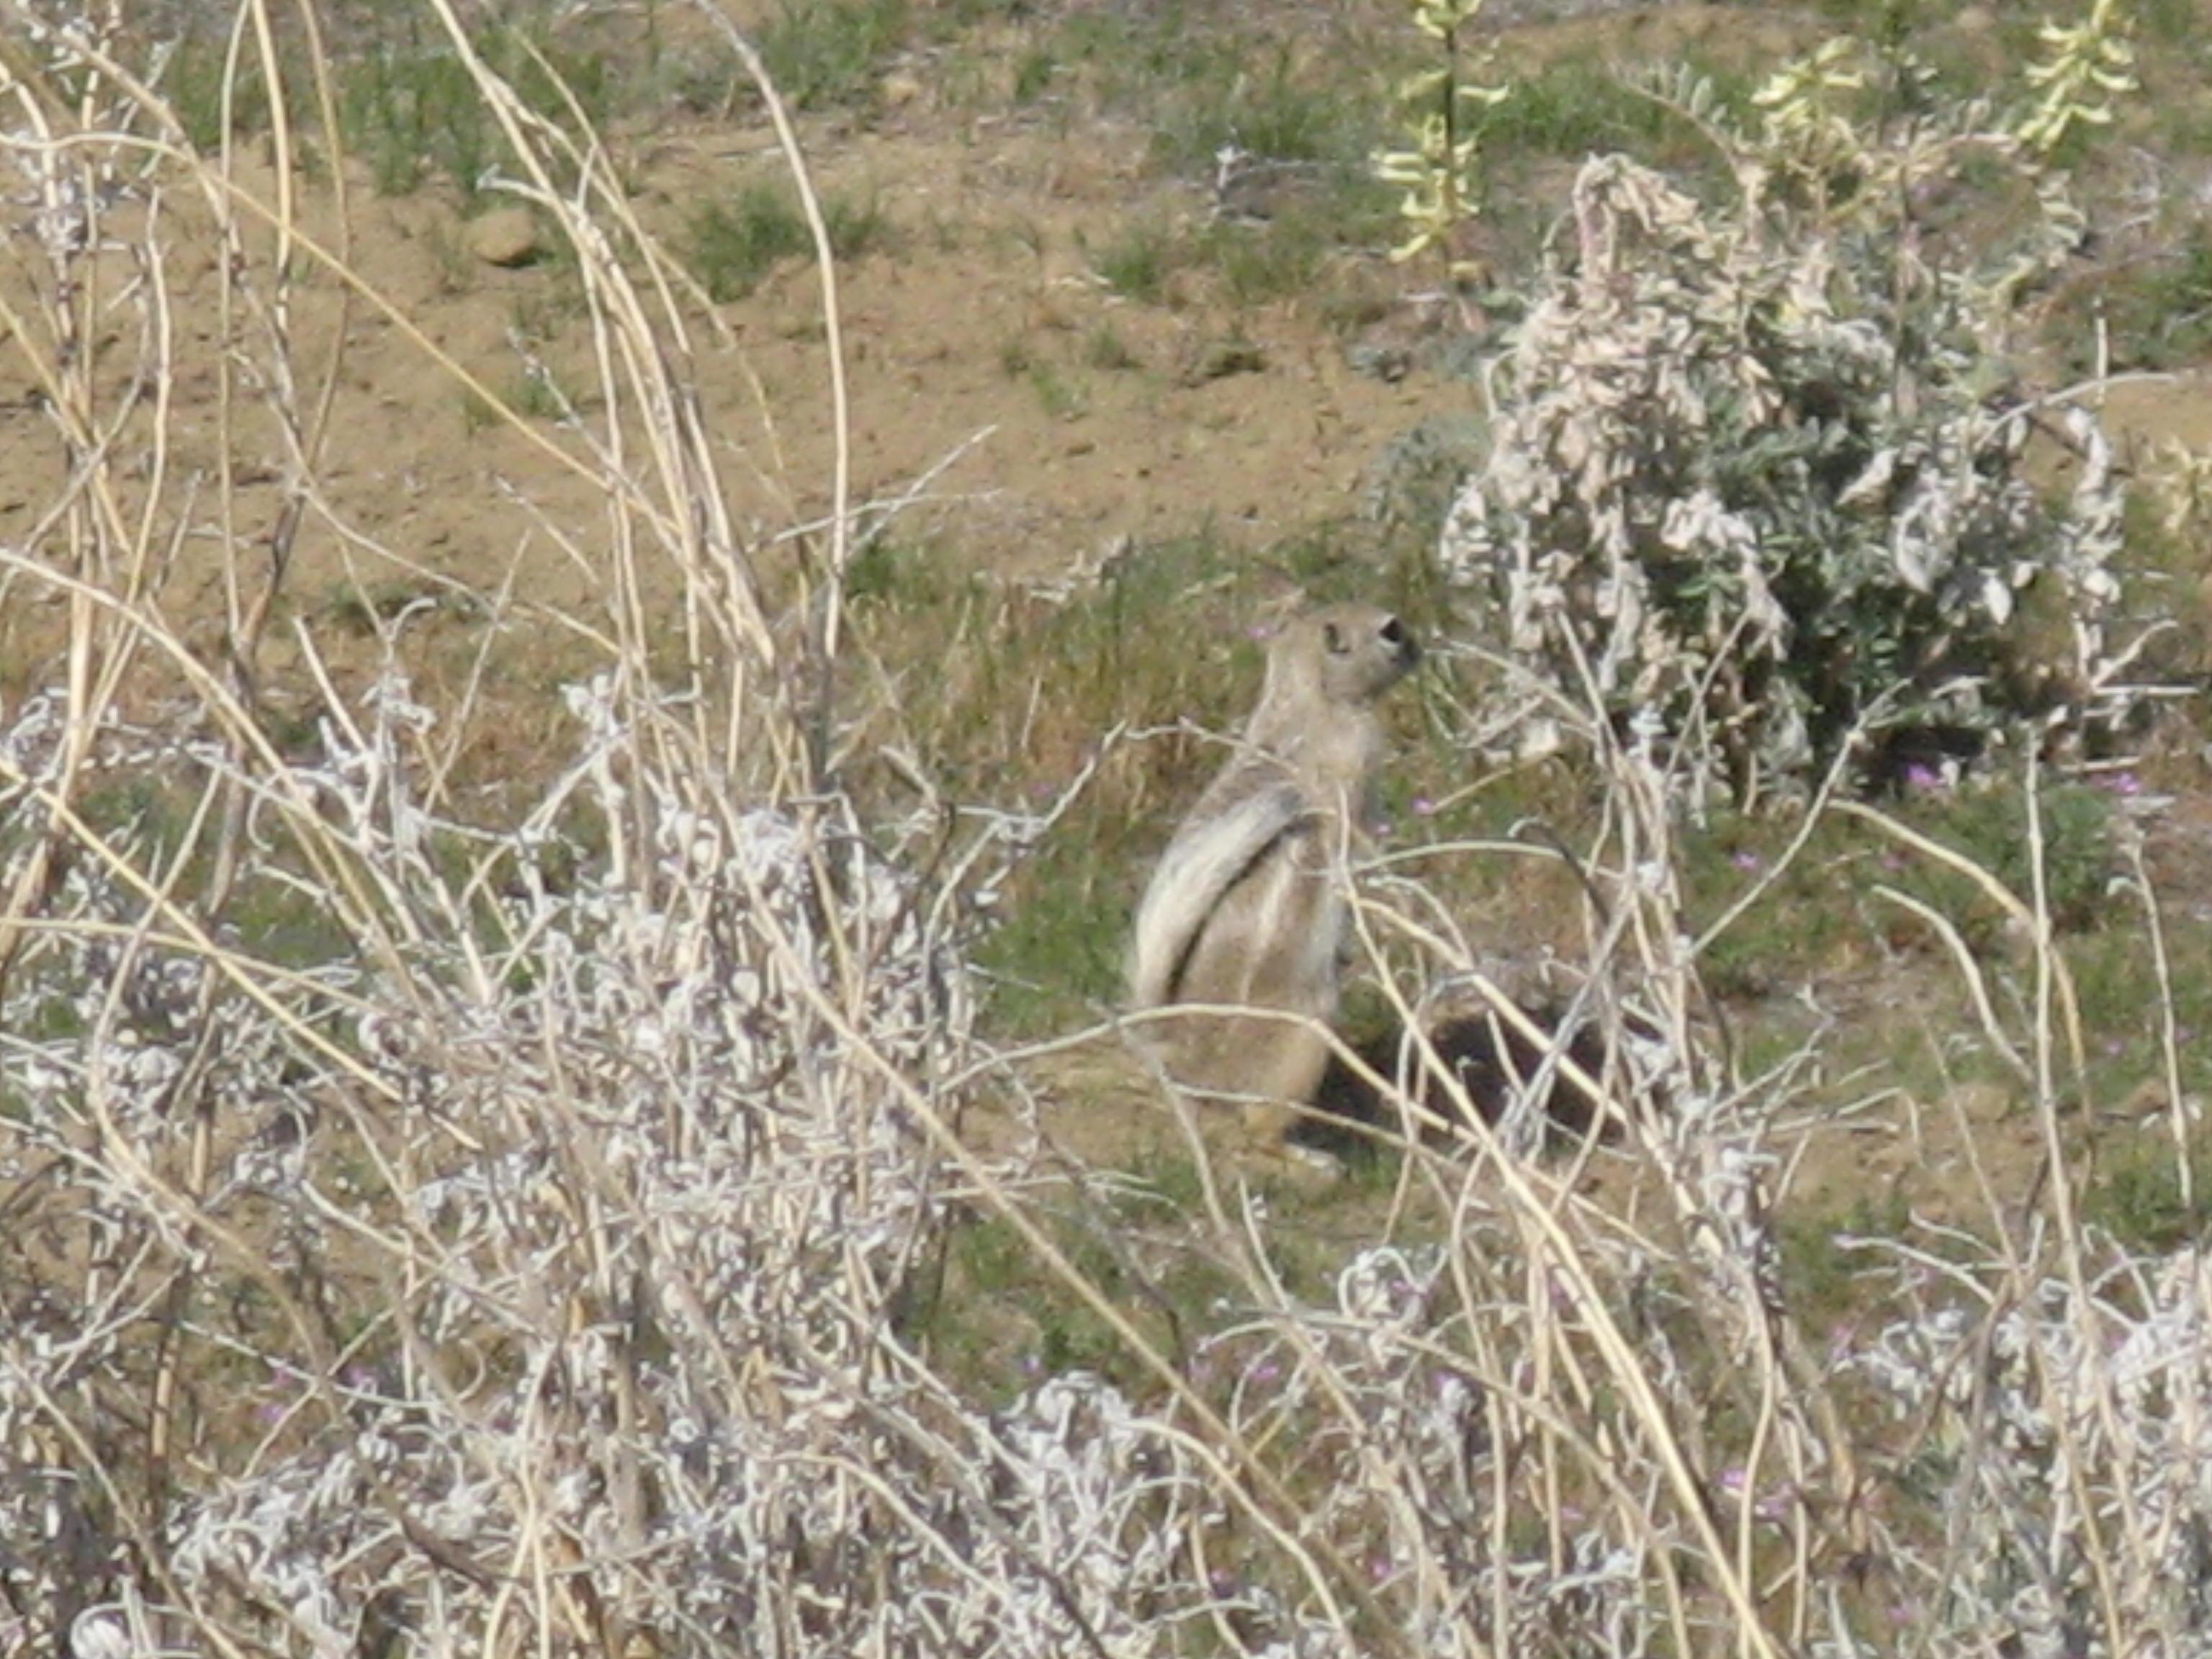 IMG_7127 San Joaquin antelope squirrel.JPG